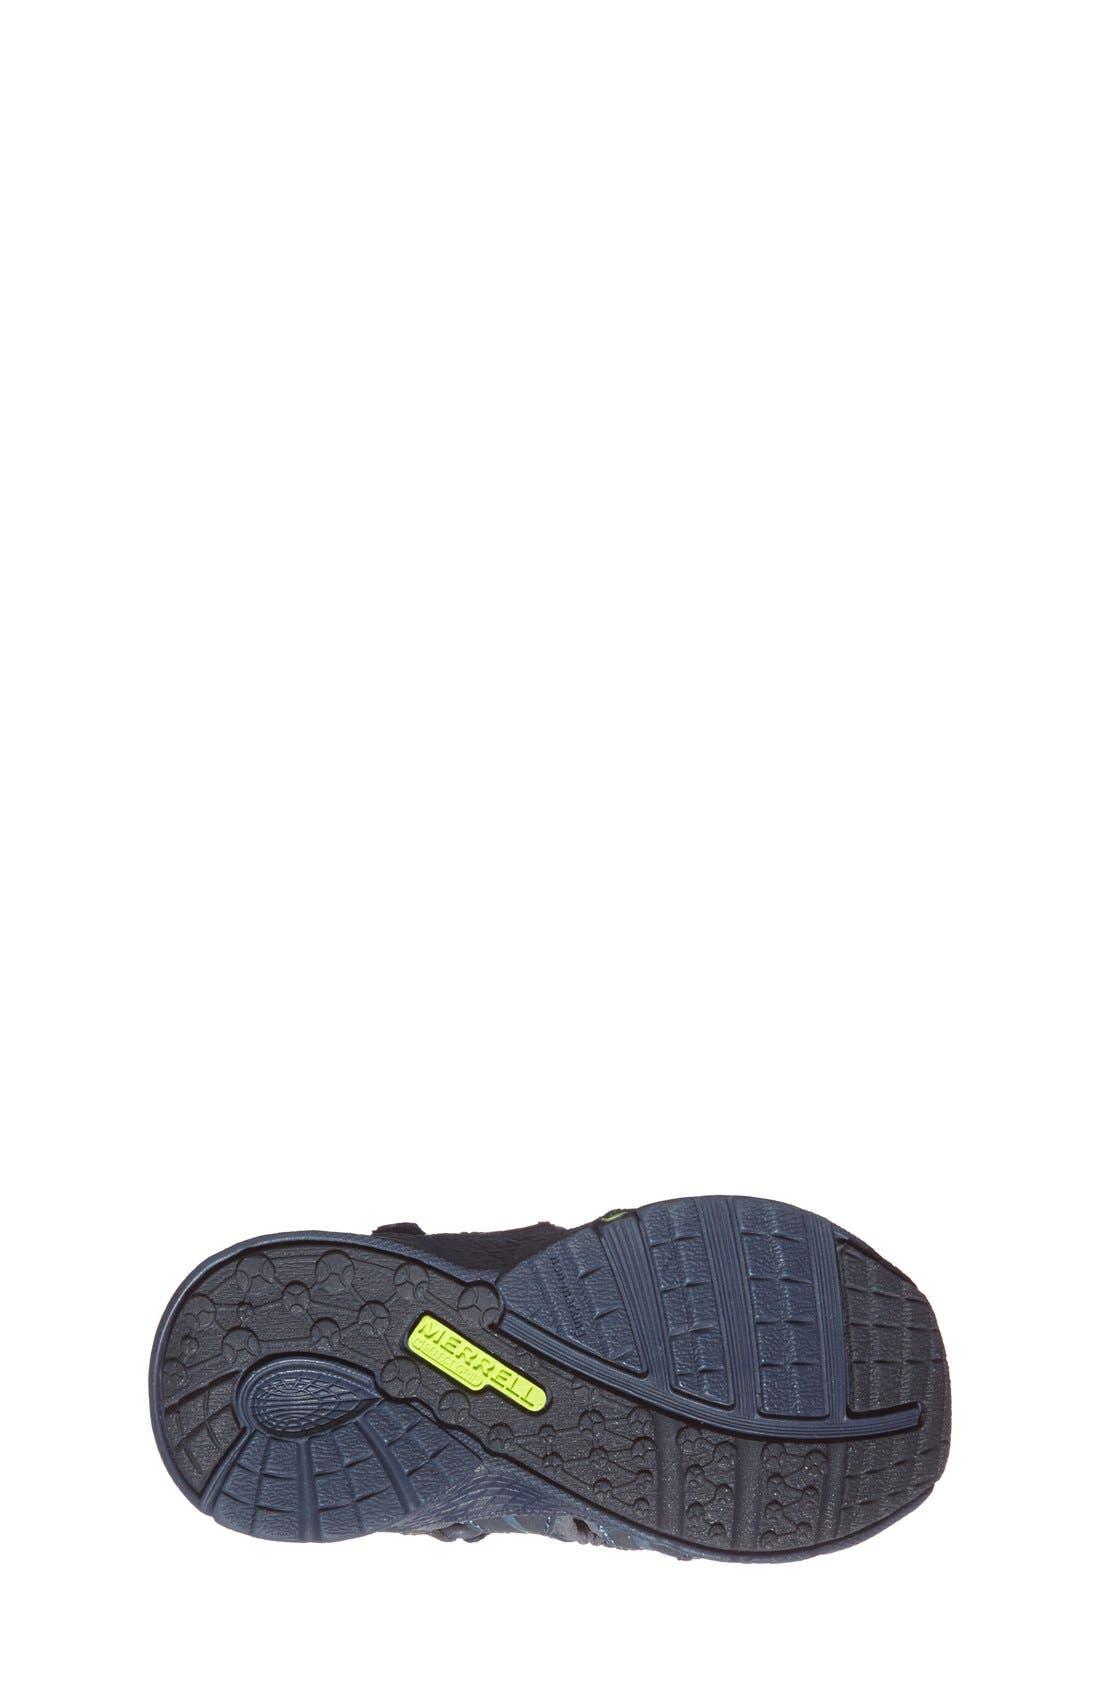 MERRELL, 'Hydro Junior' M-Select Water Sandal, Alternate thumbnail 3, color, NAVY/ GREEN